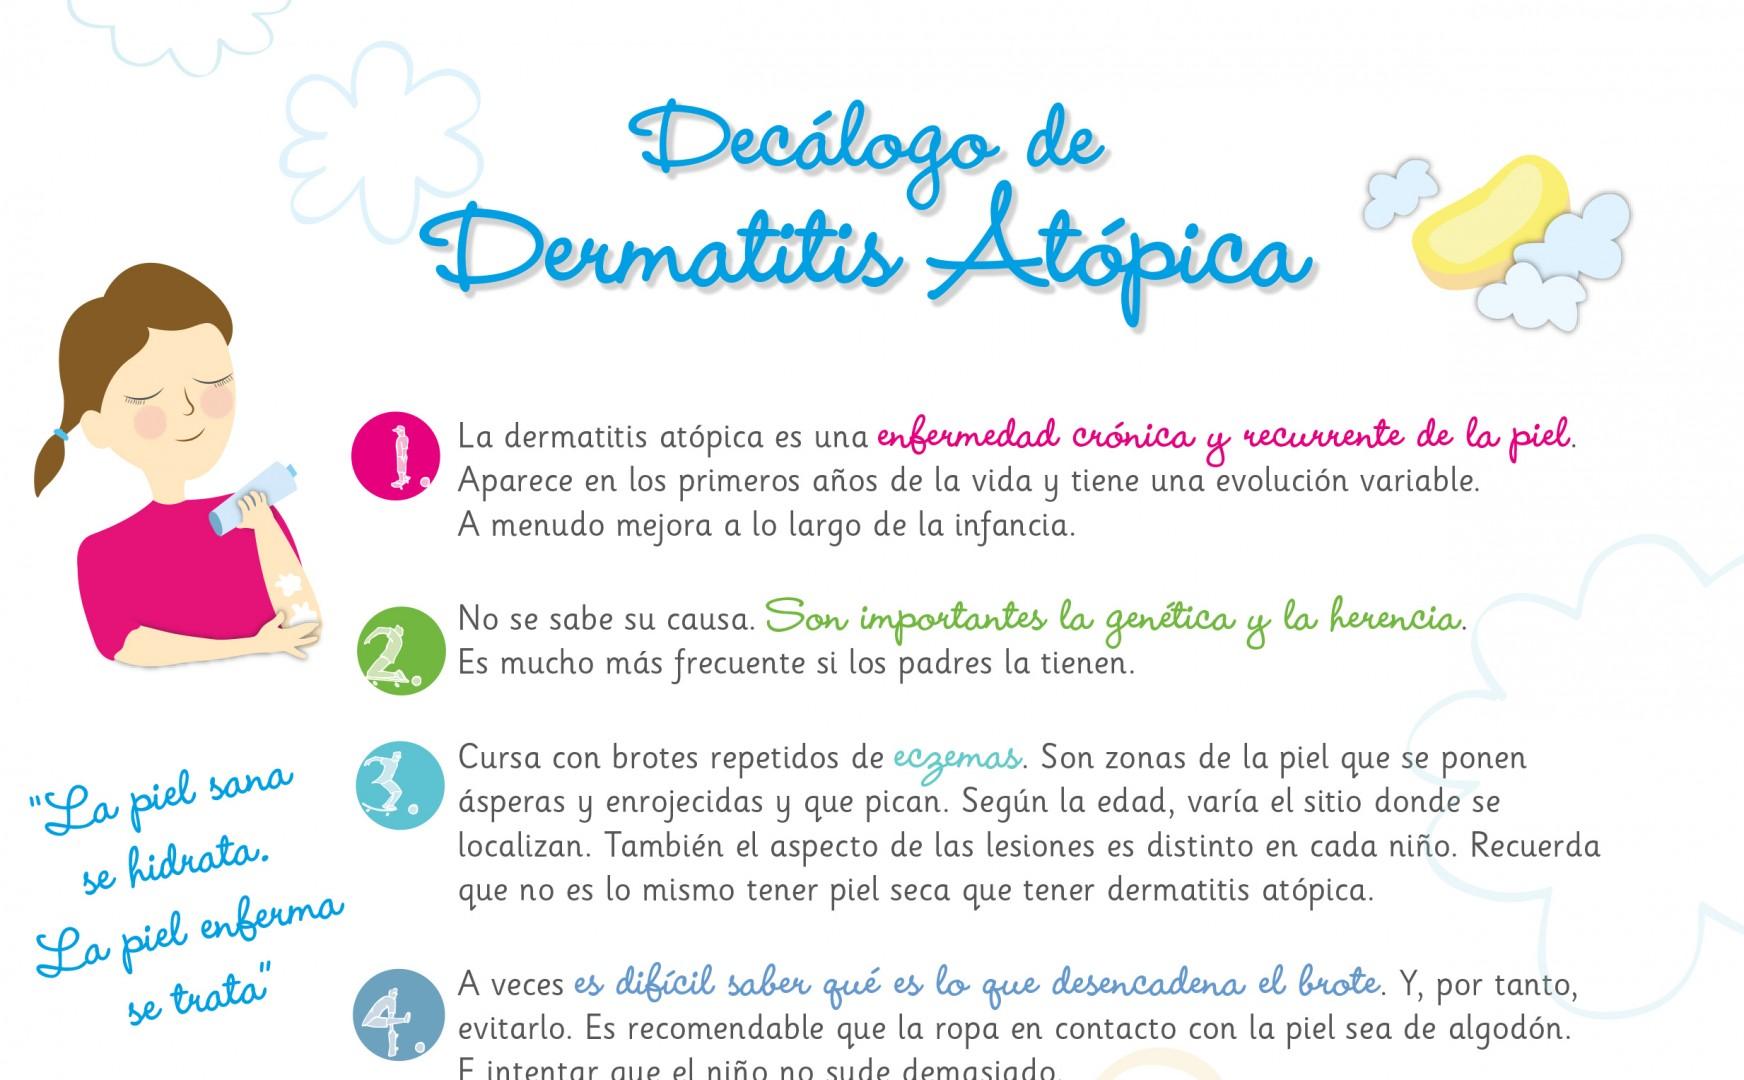 Decálogo De La Dermatitis Atópica